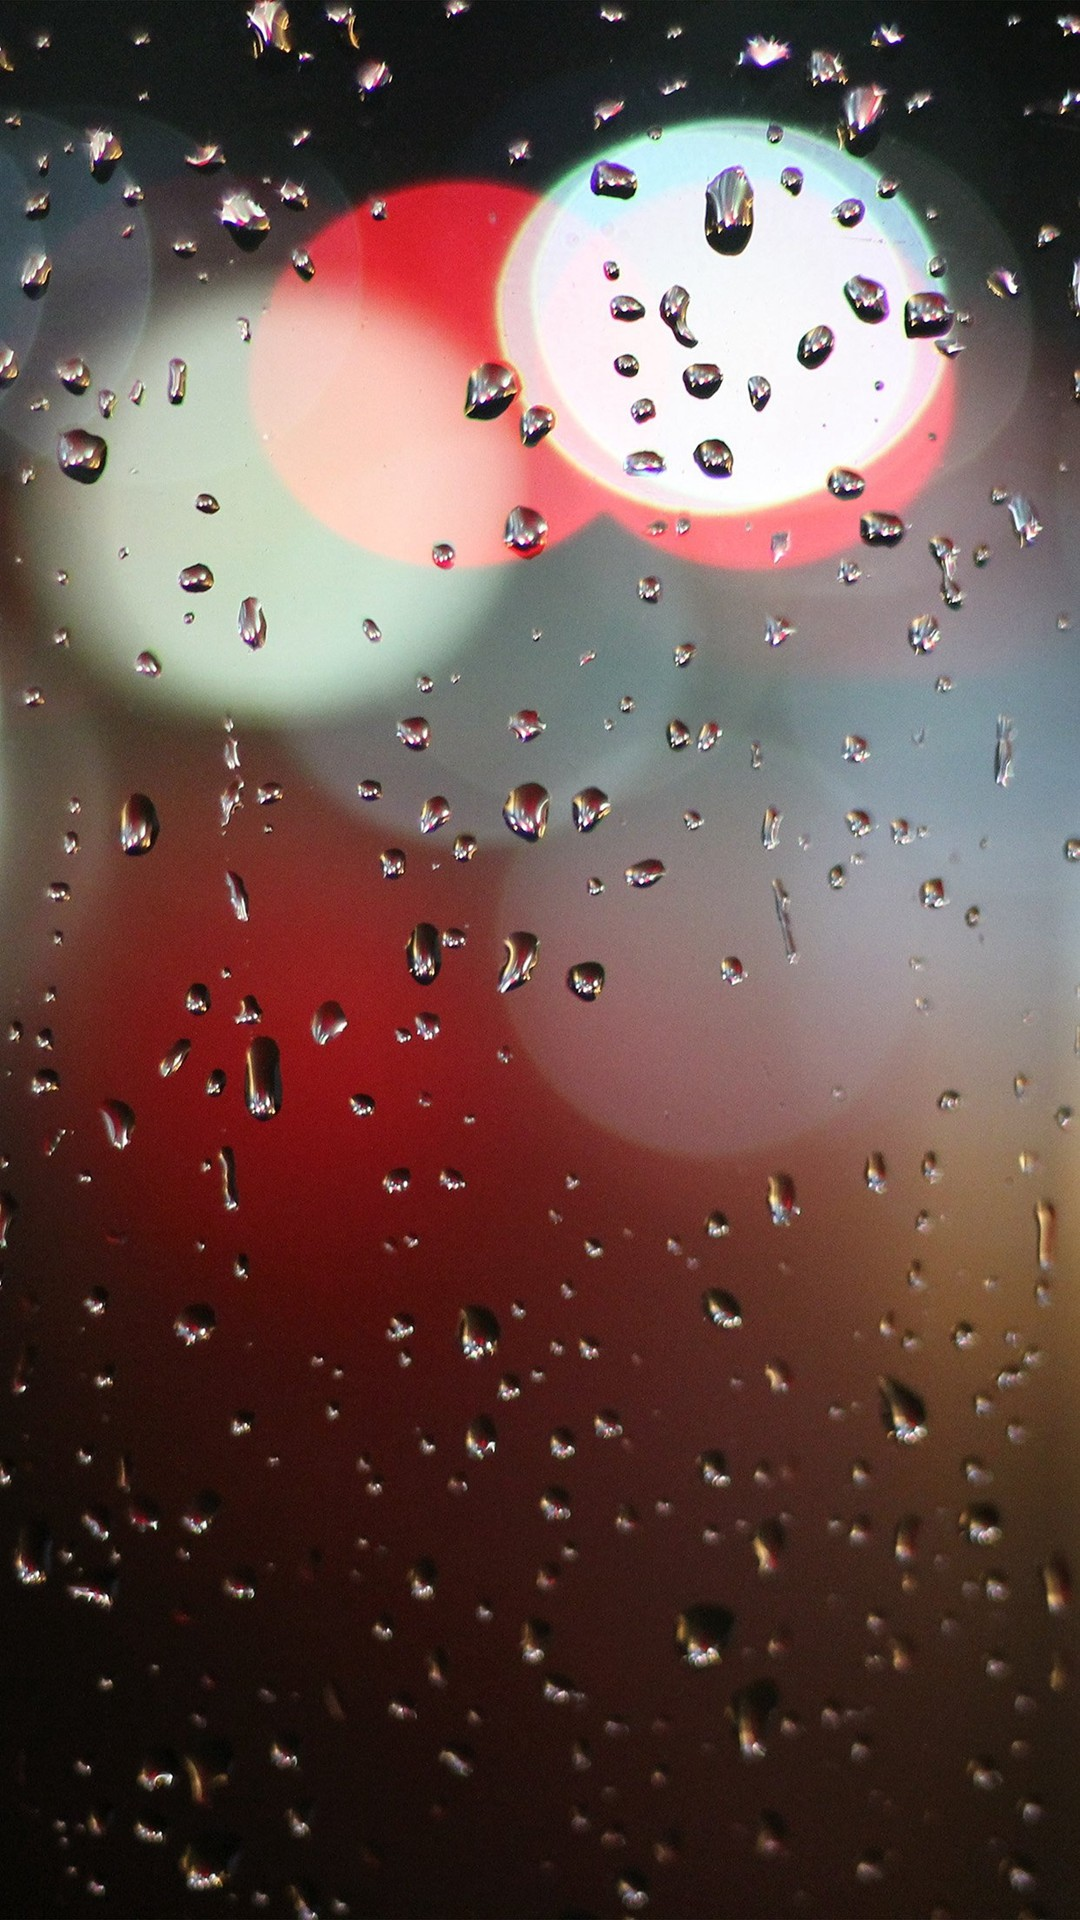 Rain On Window Wallpaper 80 Pictures